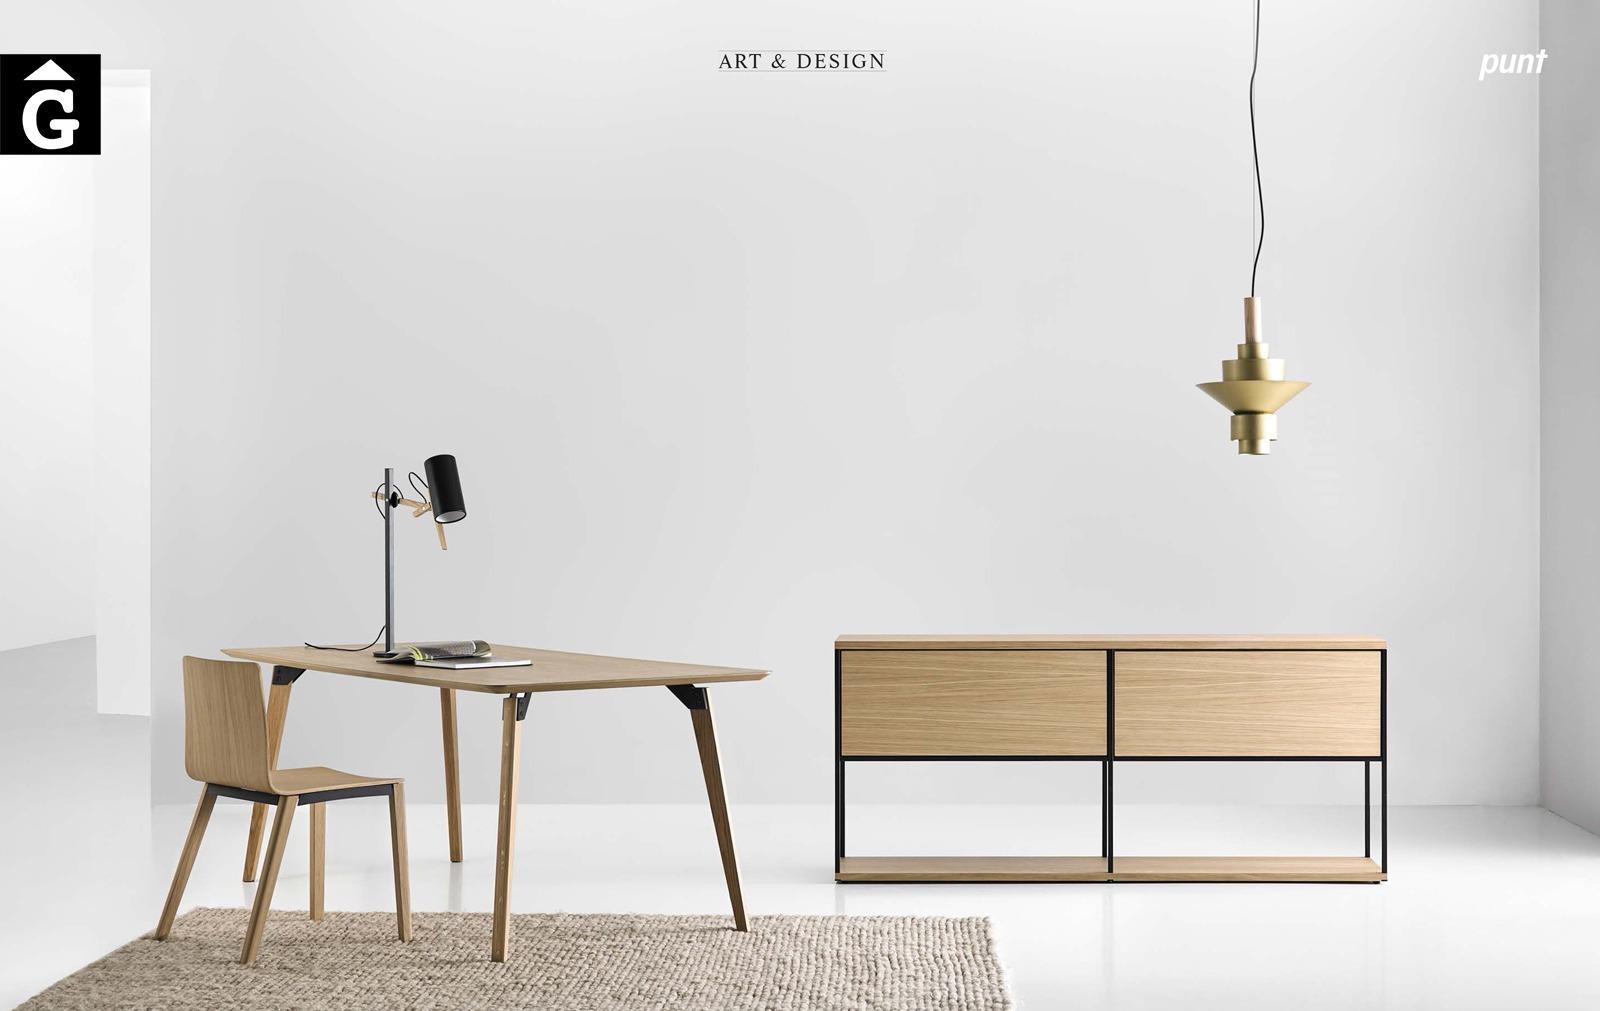 Moble aparador llibreria taula i cadira roure natural Punt mobles by mobles Gifreu